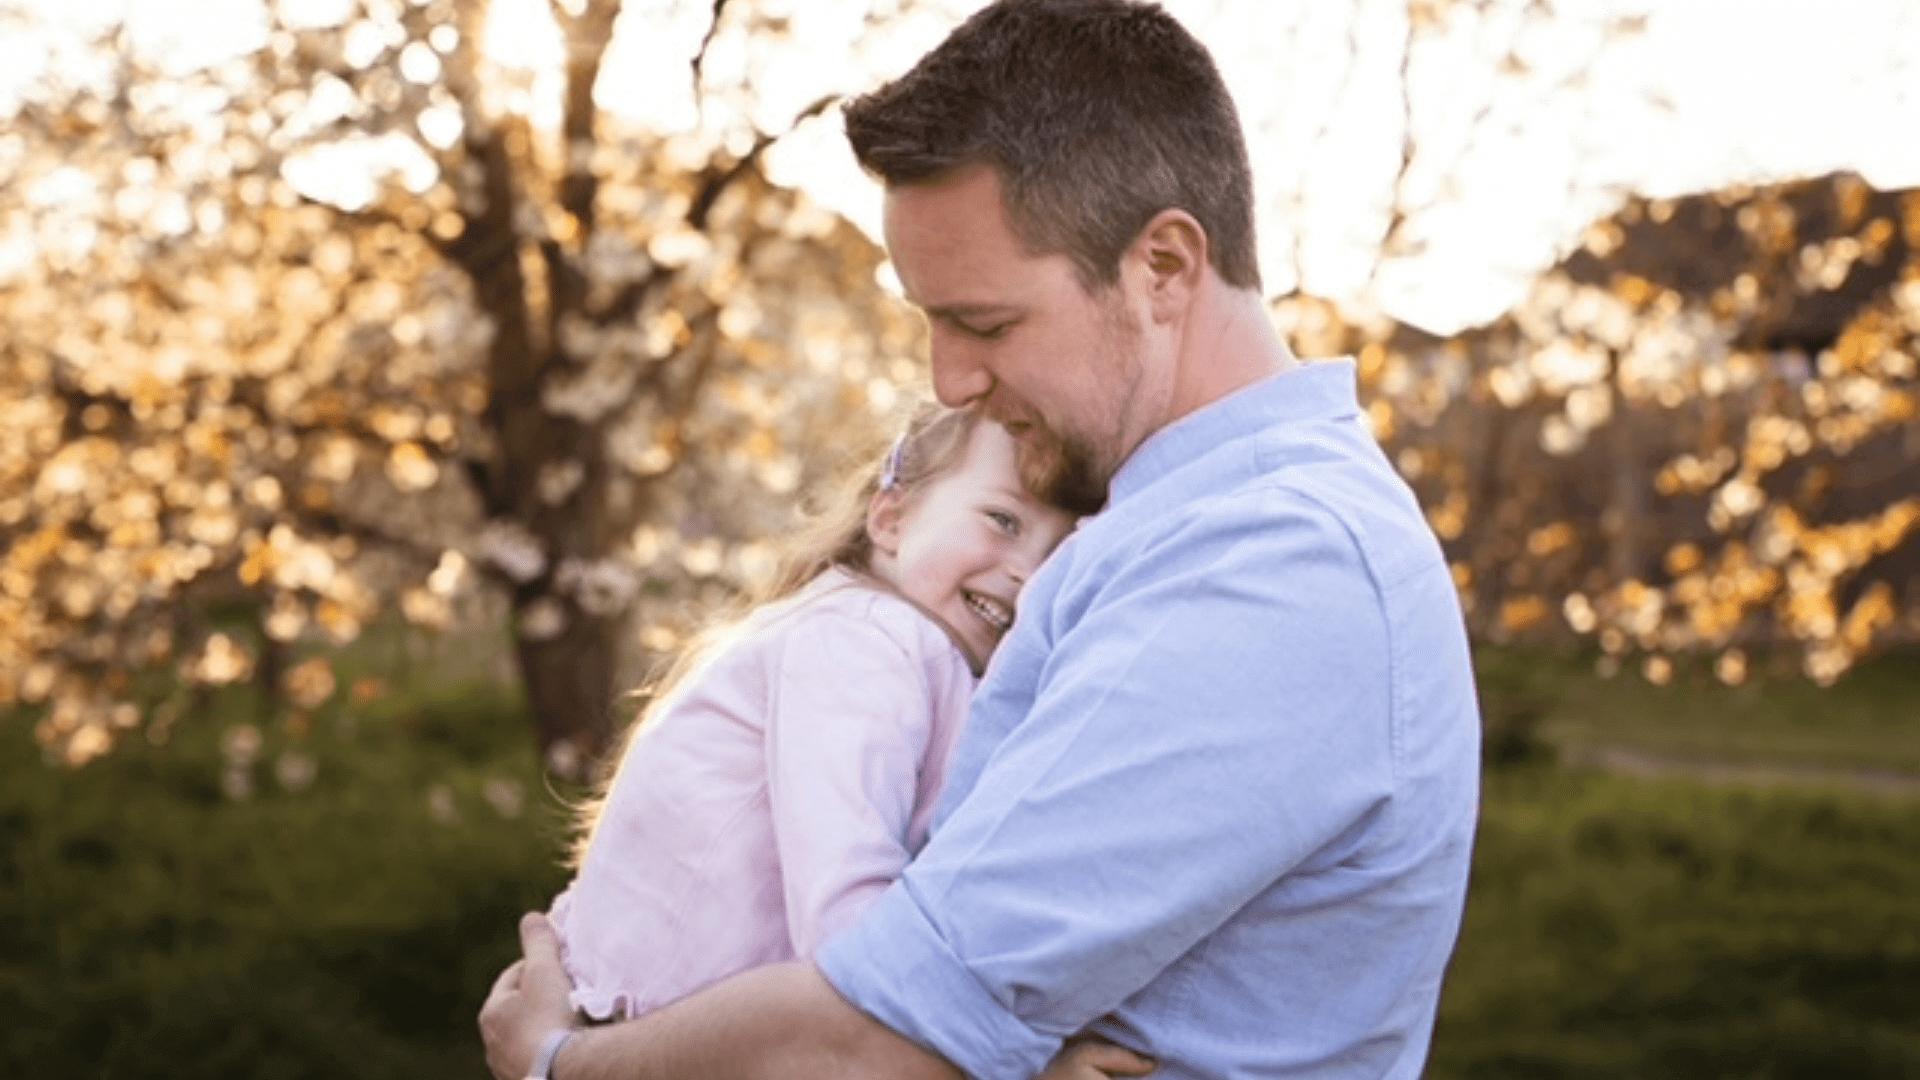 Fertility Treatment for Men – A Dad's Perspective